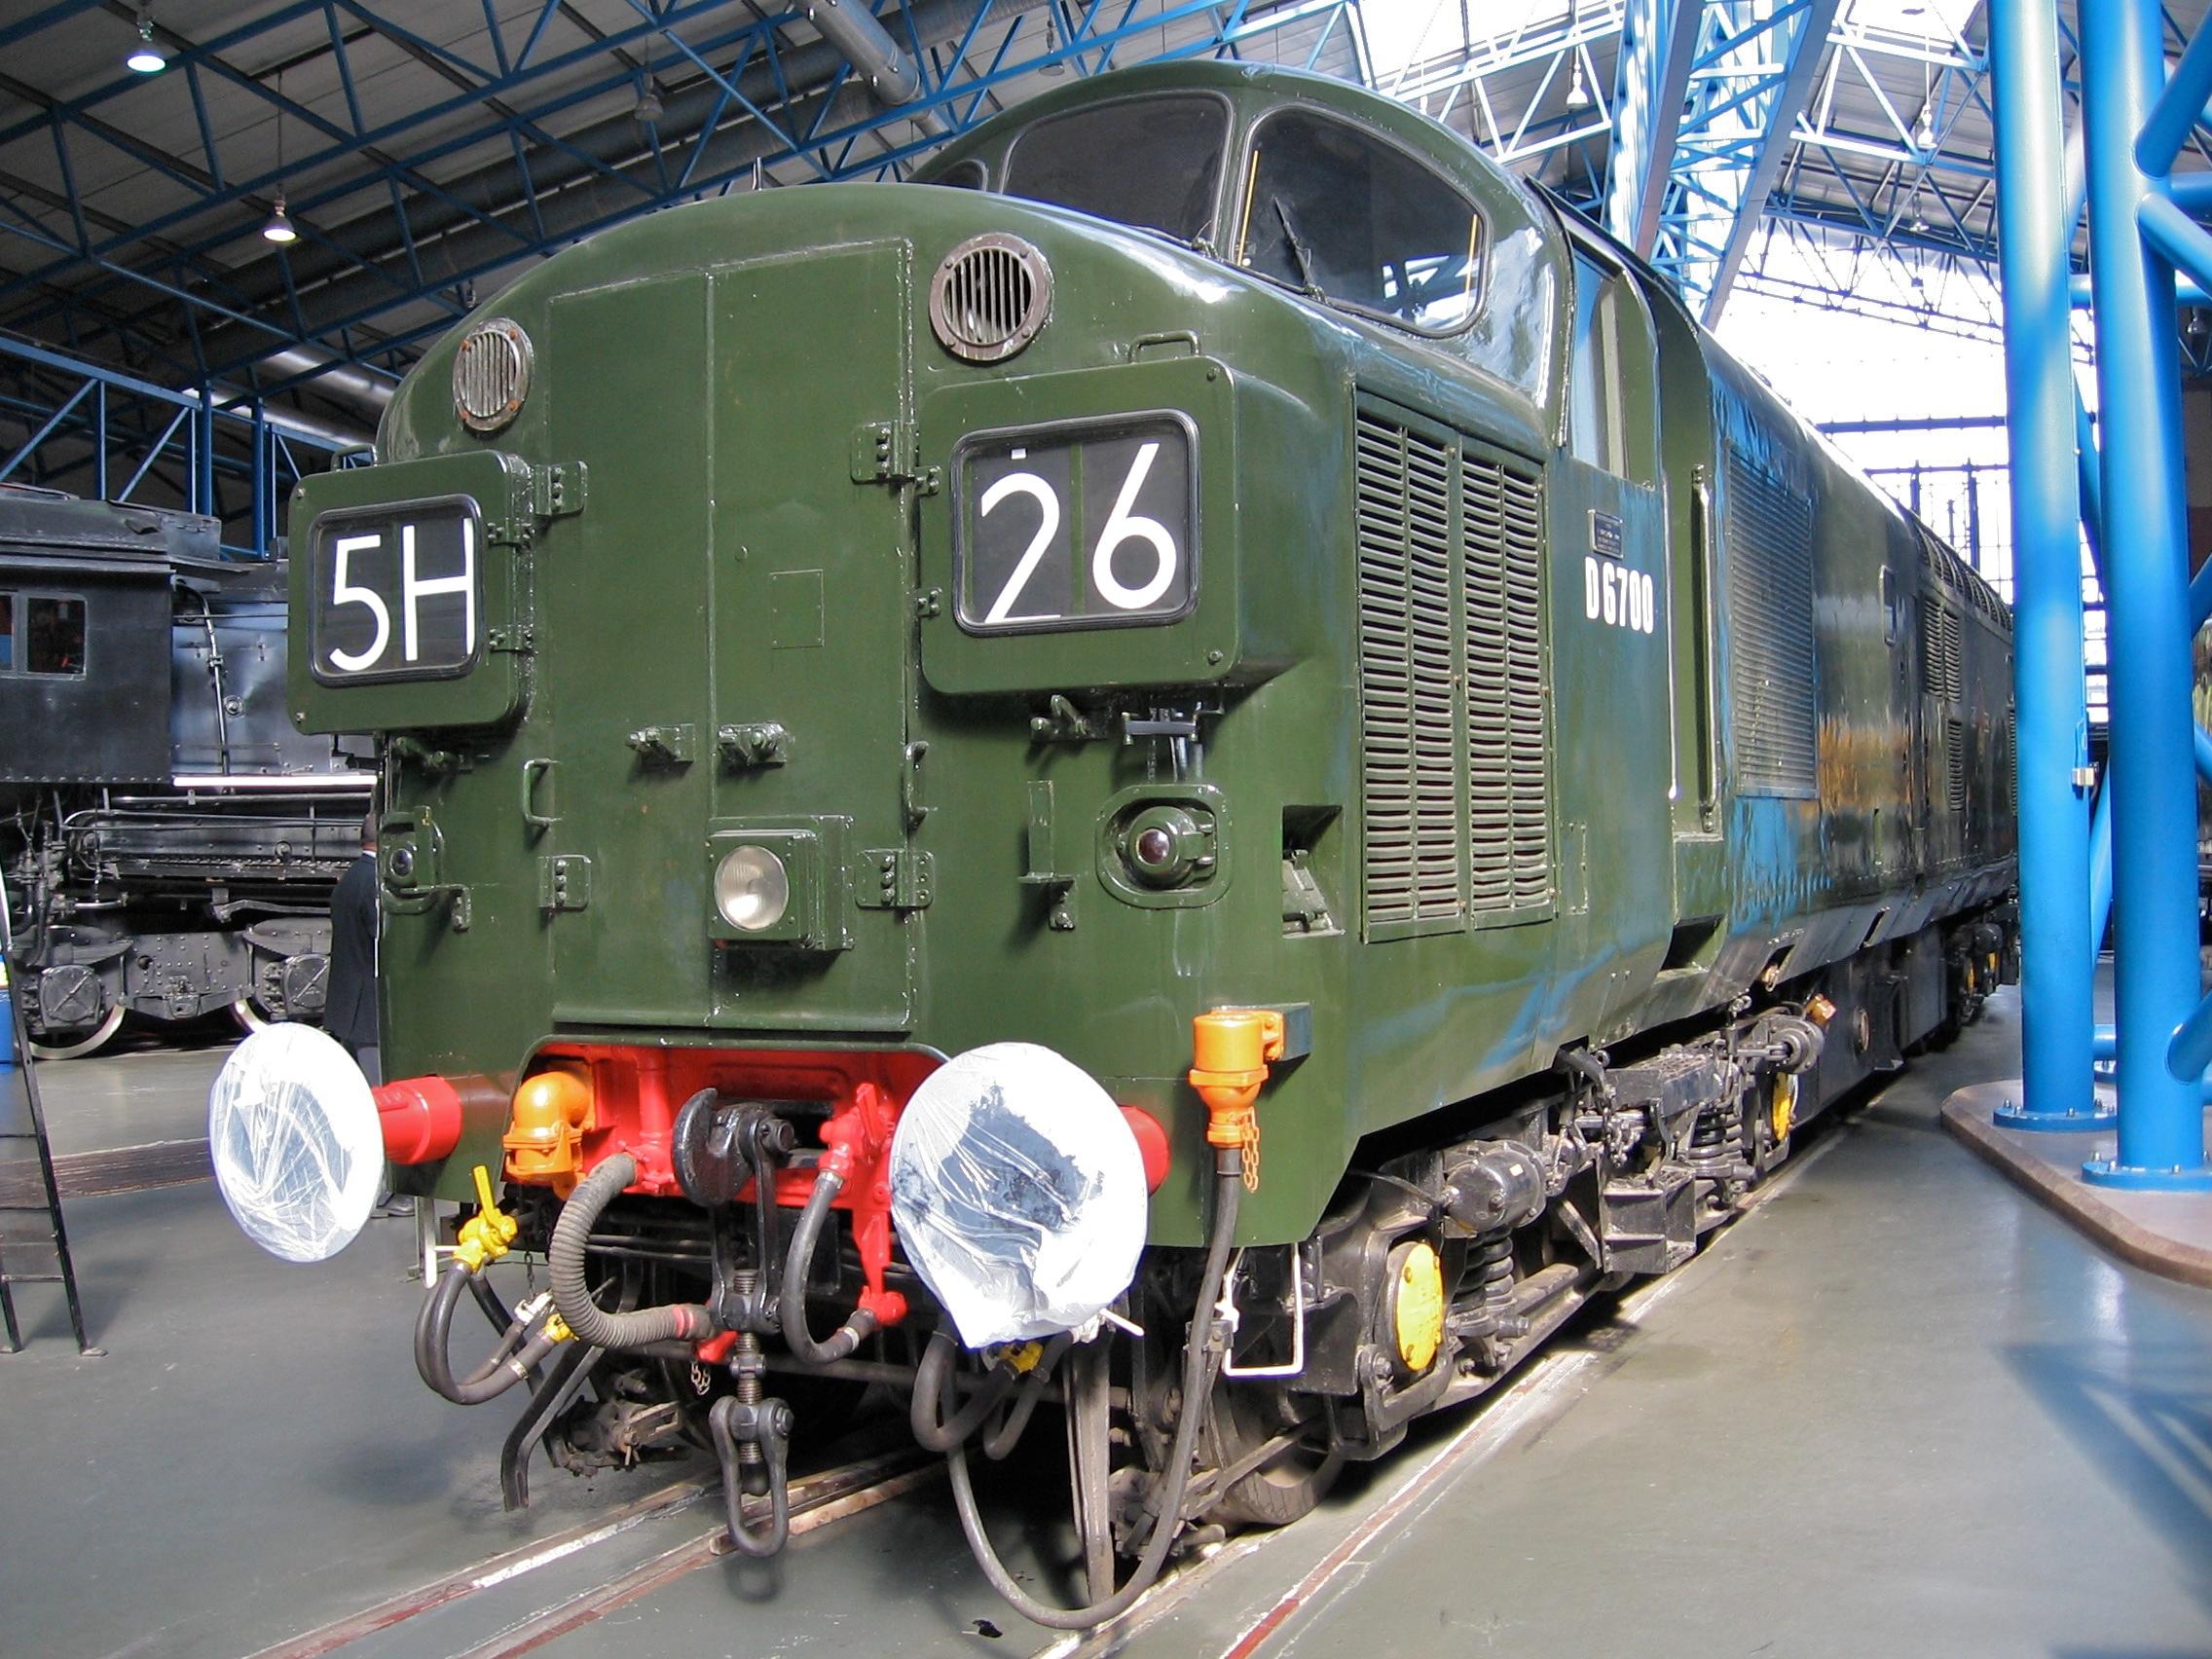 File:D6700 National Railway Museum York.jpg - Wikimedia Commons